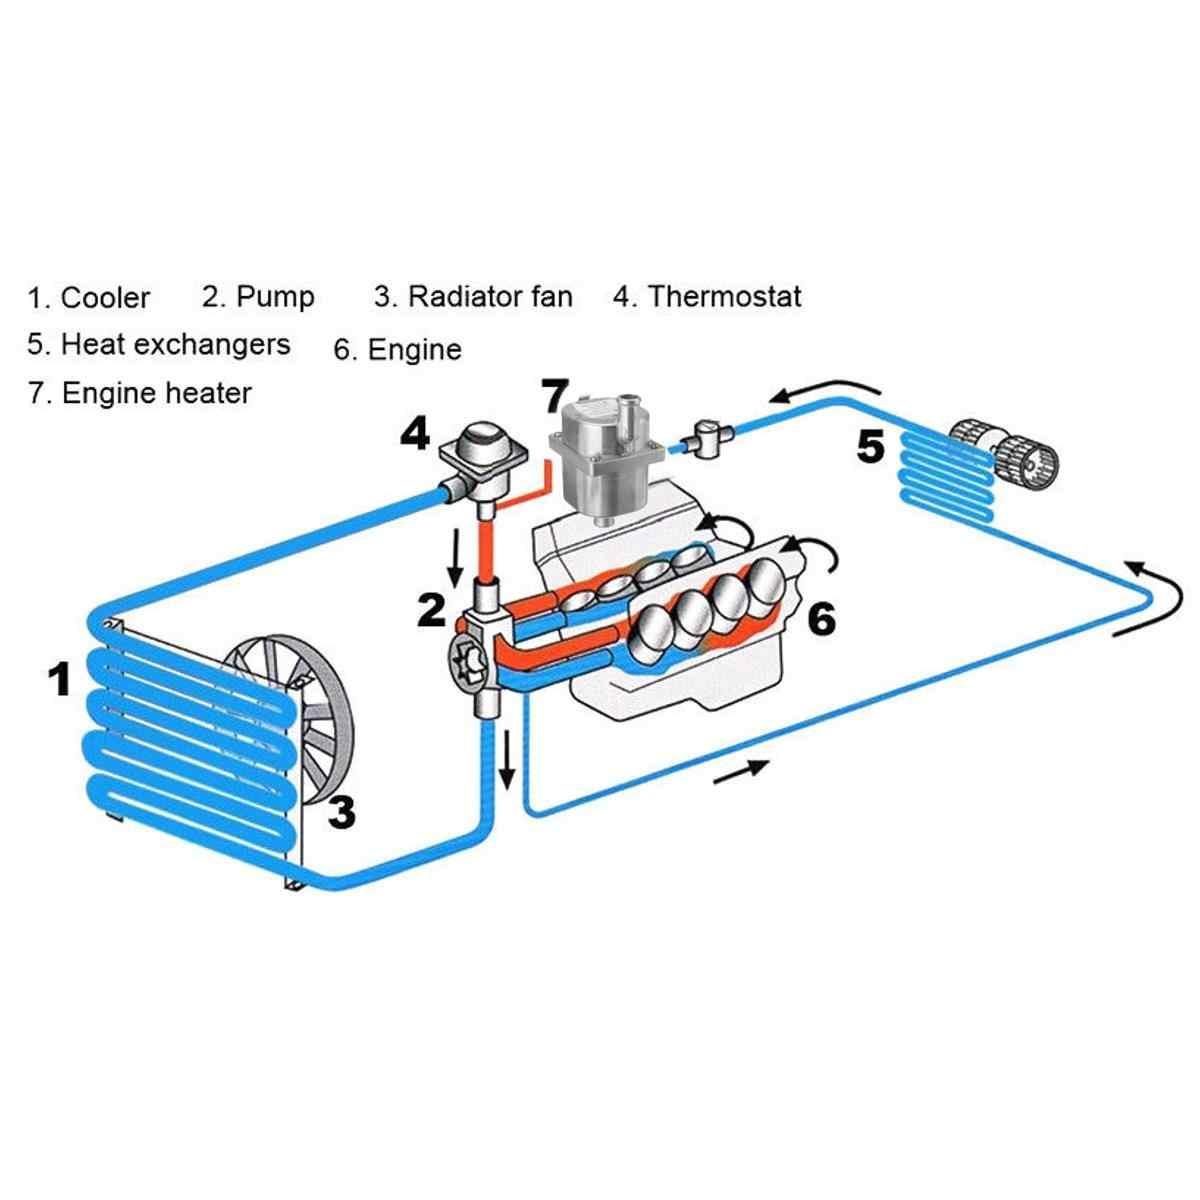 2000W Car Engine Coolant Heater Preheater Not Webastos Eberspacher Motor  Heating Preheating Air Parking Heater